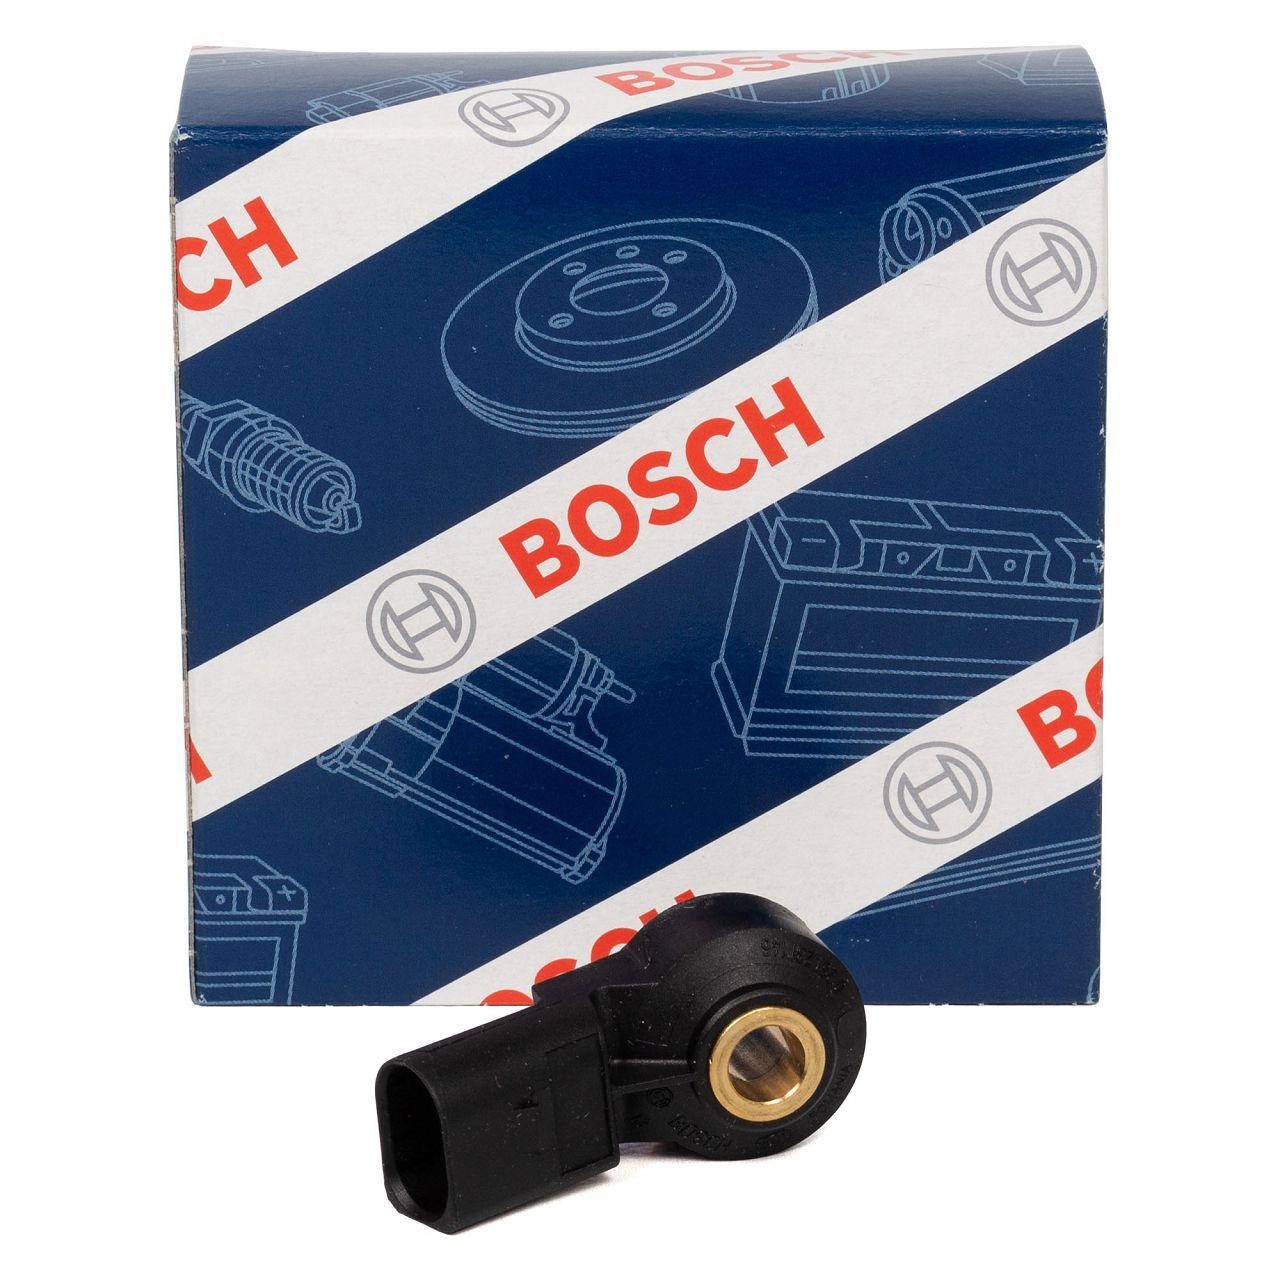 BOSCH 0261231146 Klopfsensor AUDI A1 A3 8L 8P A4 8E SEAT Ibiza SKODA VW Golf 5 6 7